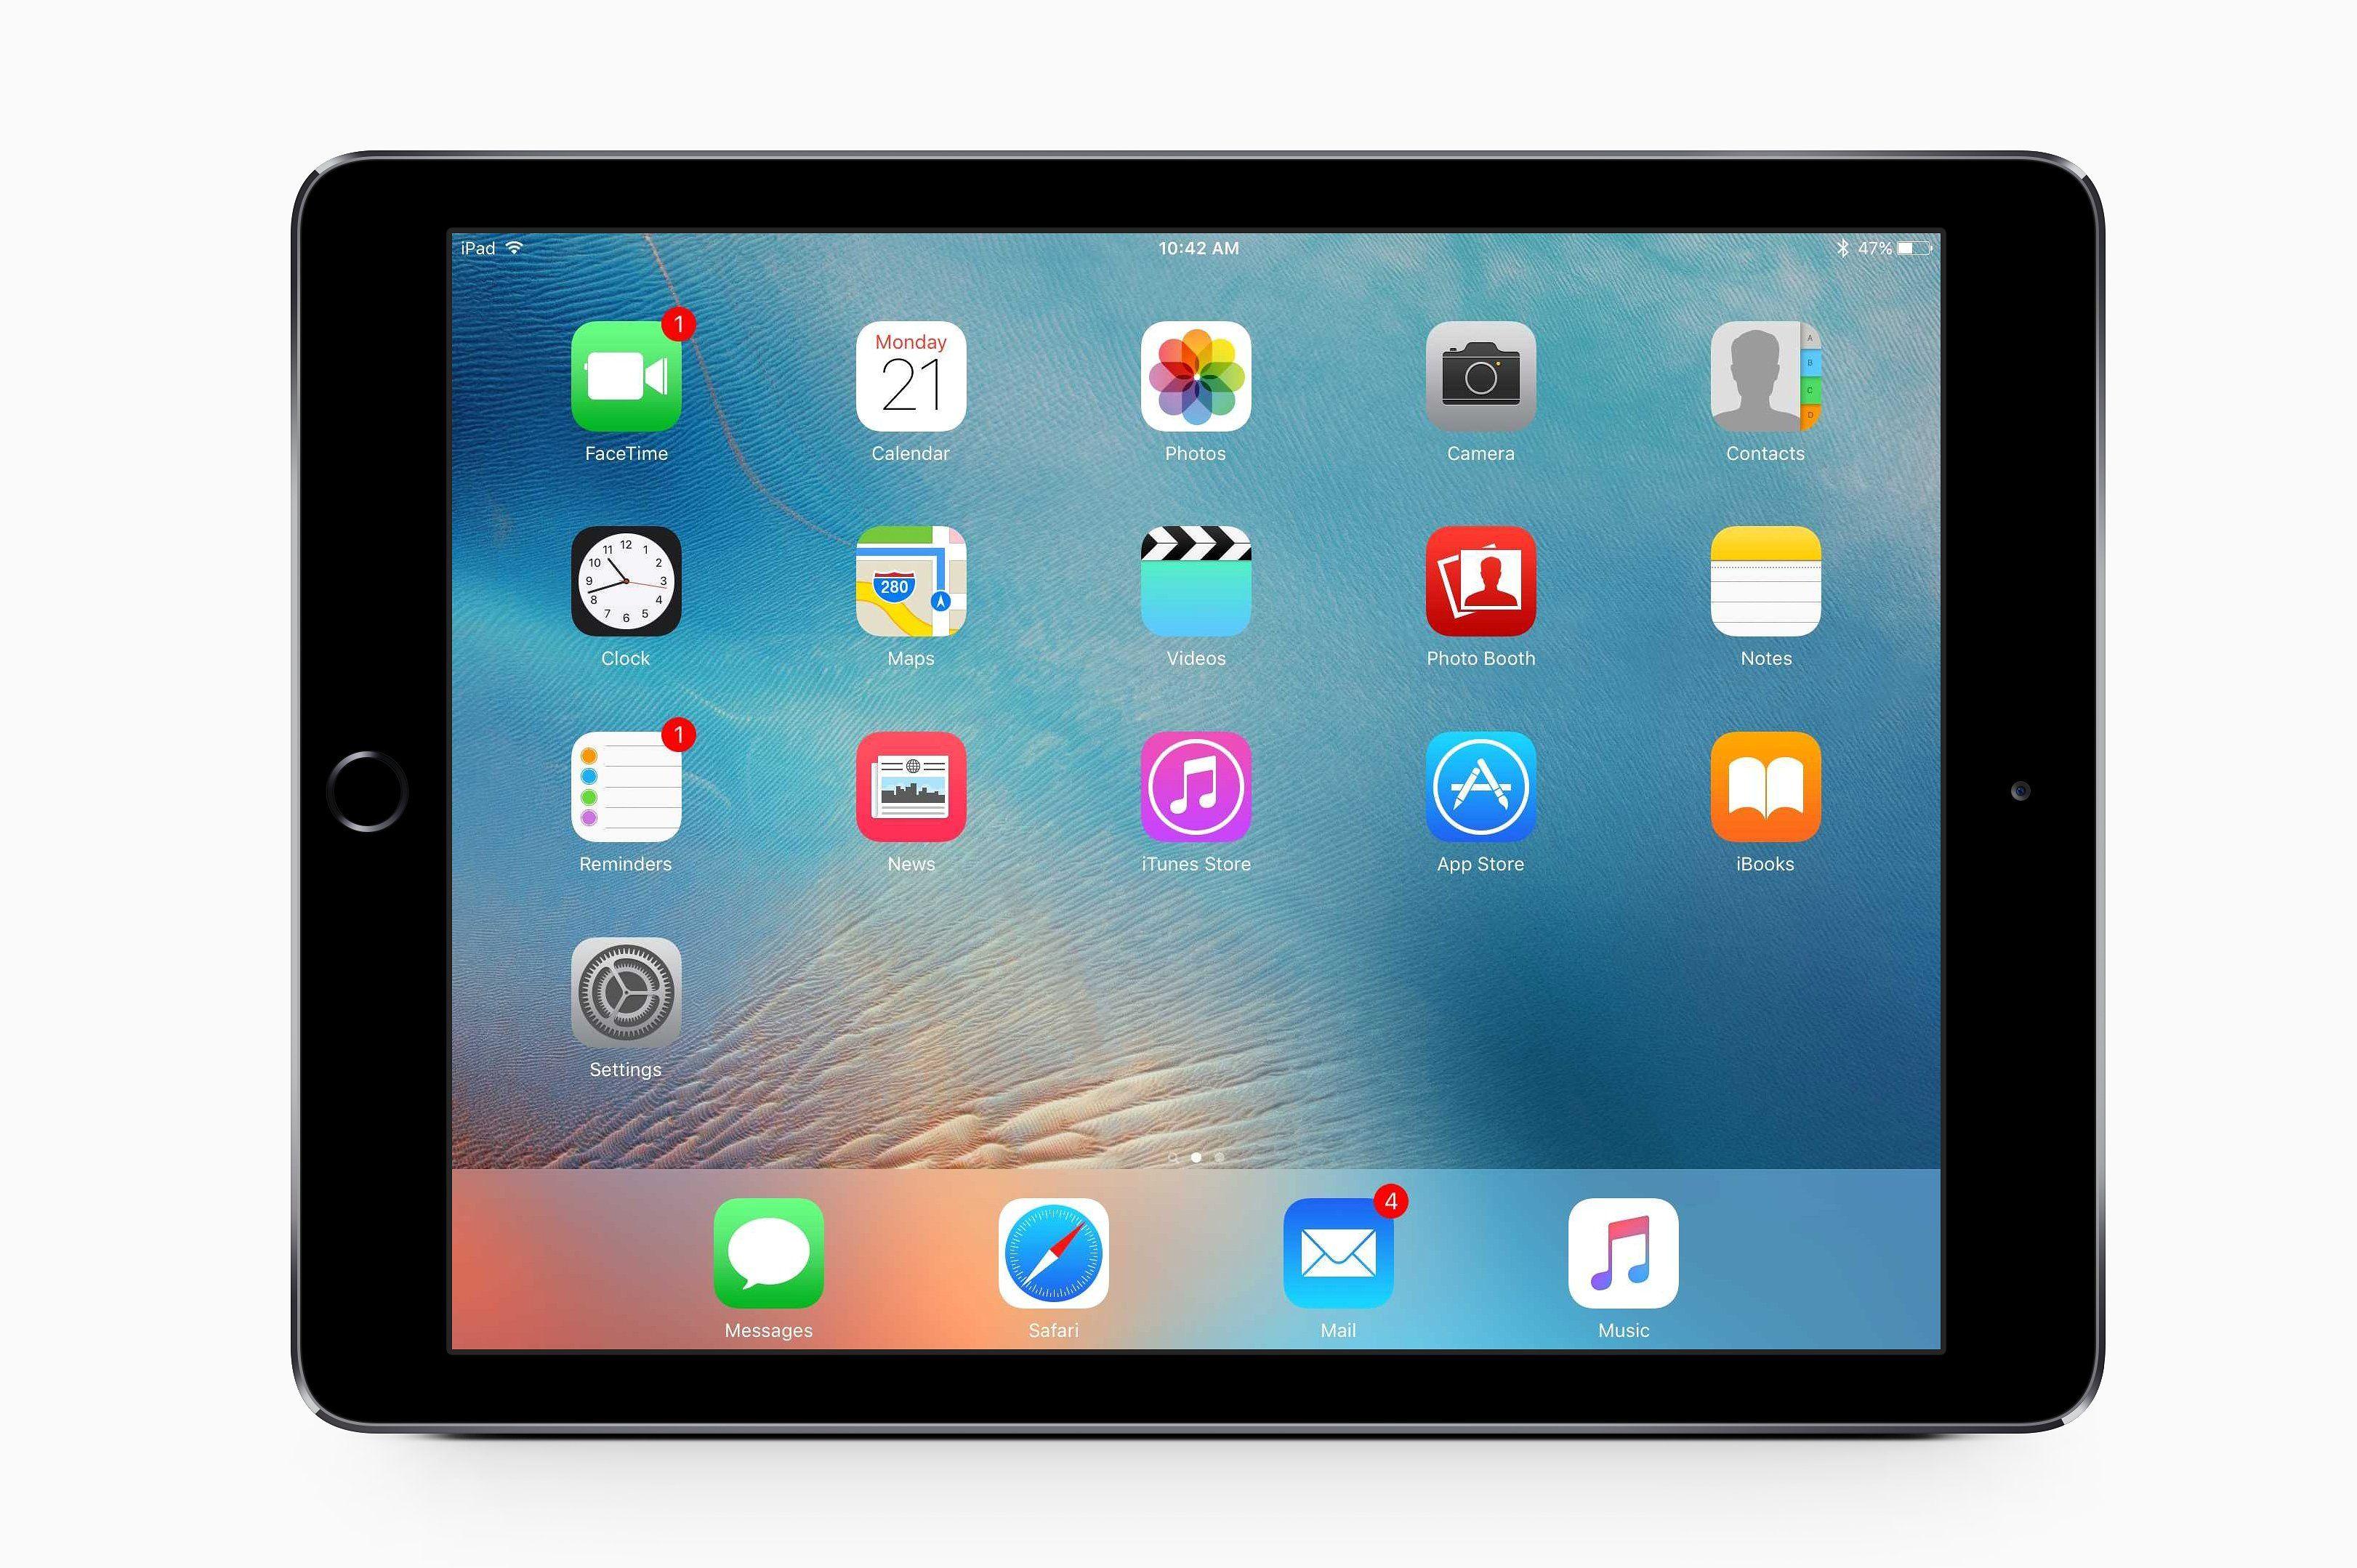 iPad Air Landscape PSD • Mockup | Ipad air, Mockup ...